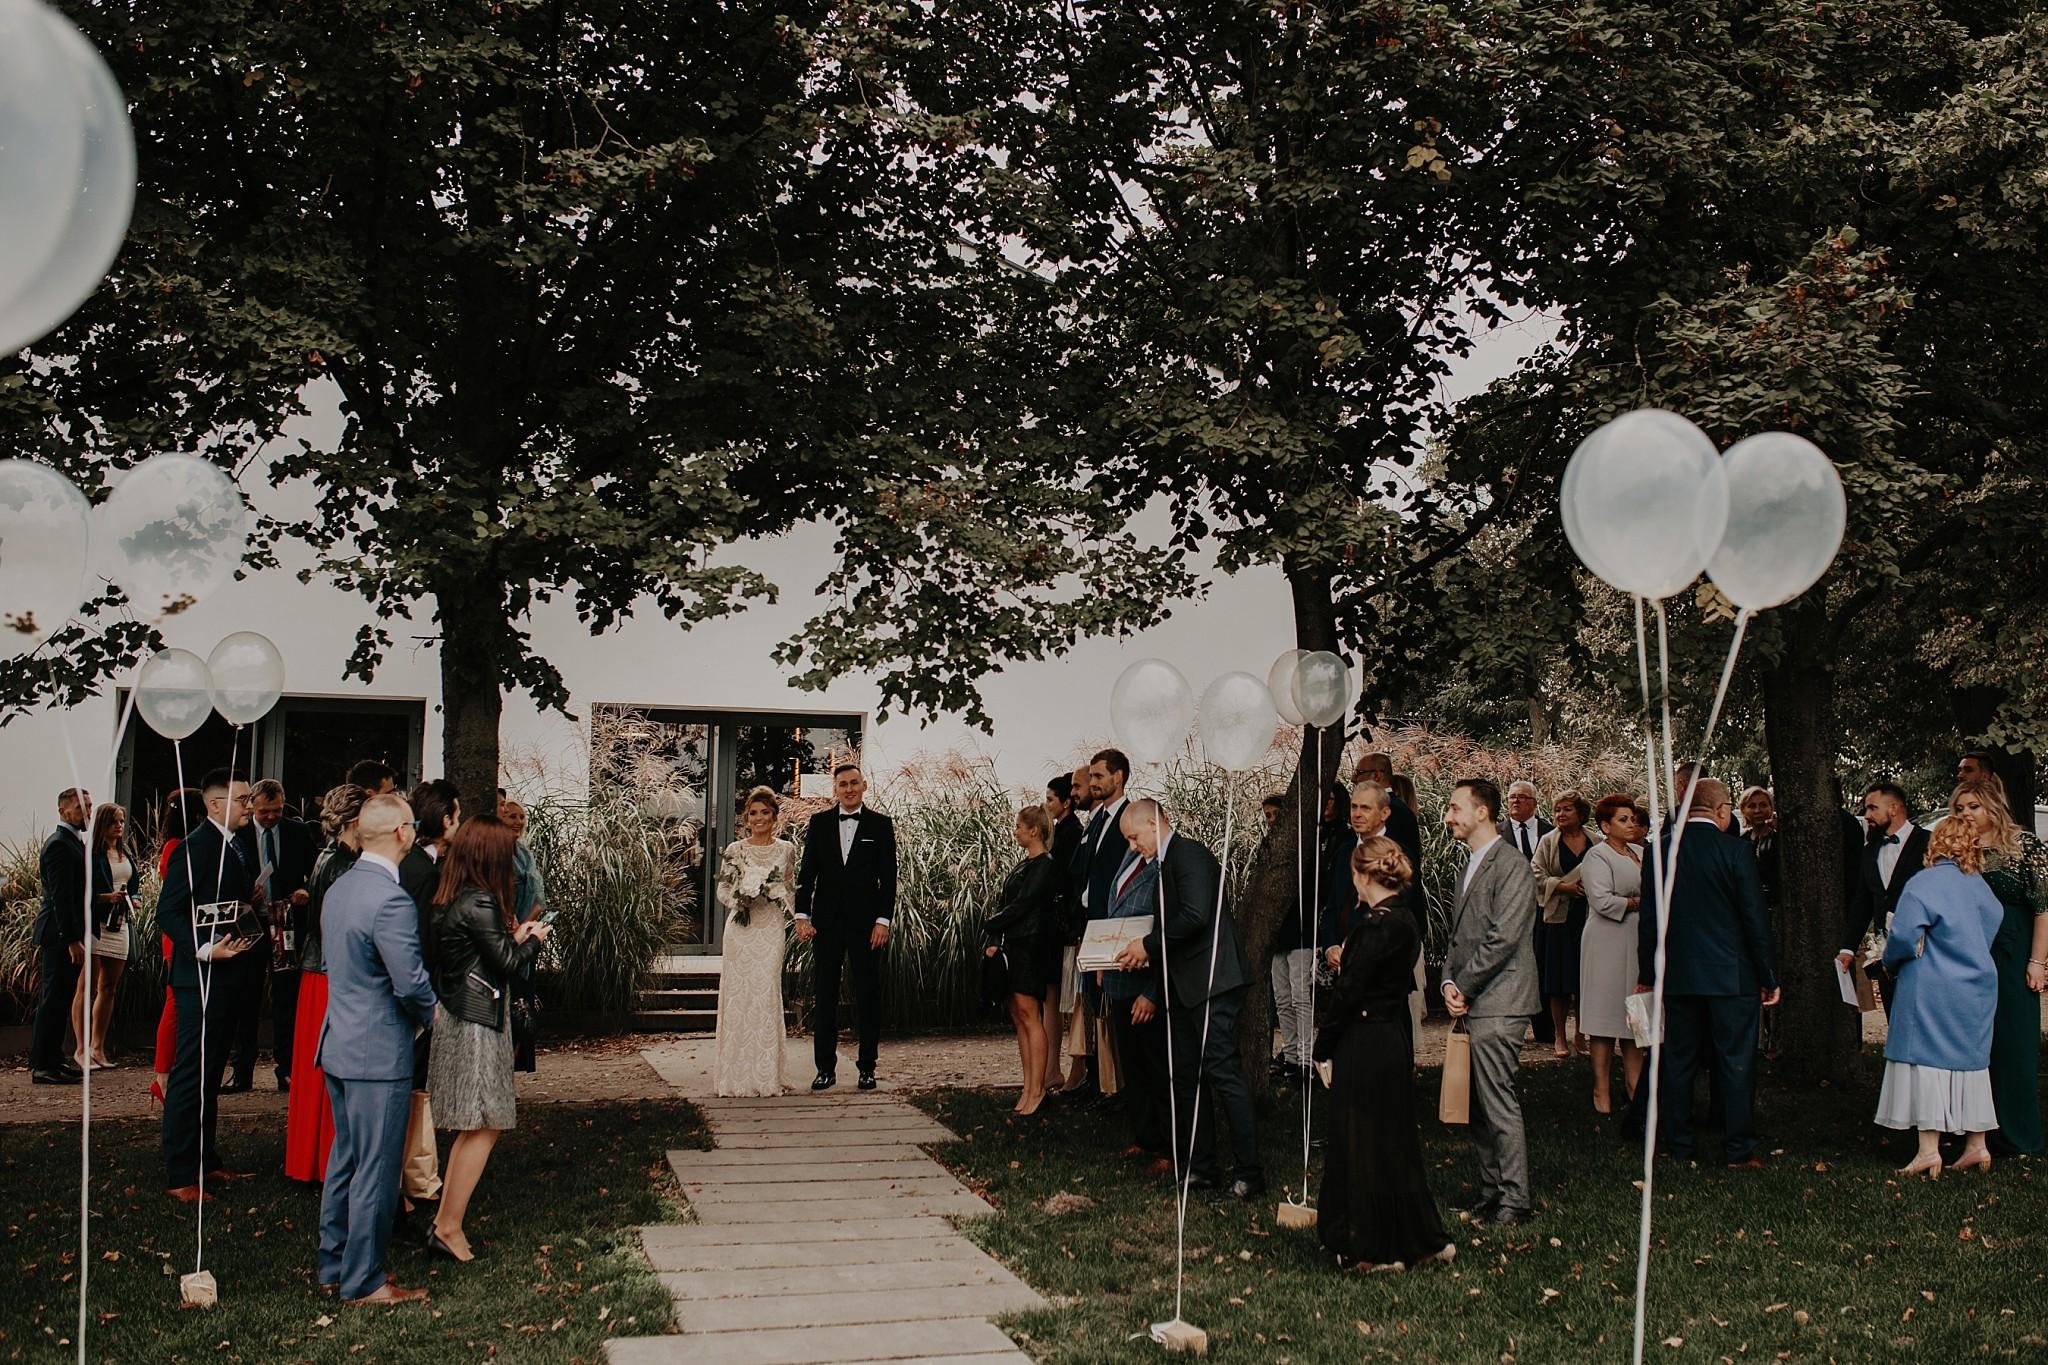 fotograf poznan wesele dobra truskawka piekne wesele pod poznaniem wesele w dobrej truskawce piekna para mloda slub marzen slub koronawirus slub listopad wesele koronawirus 259